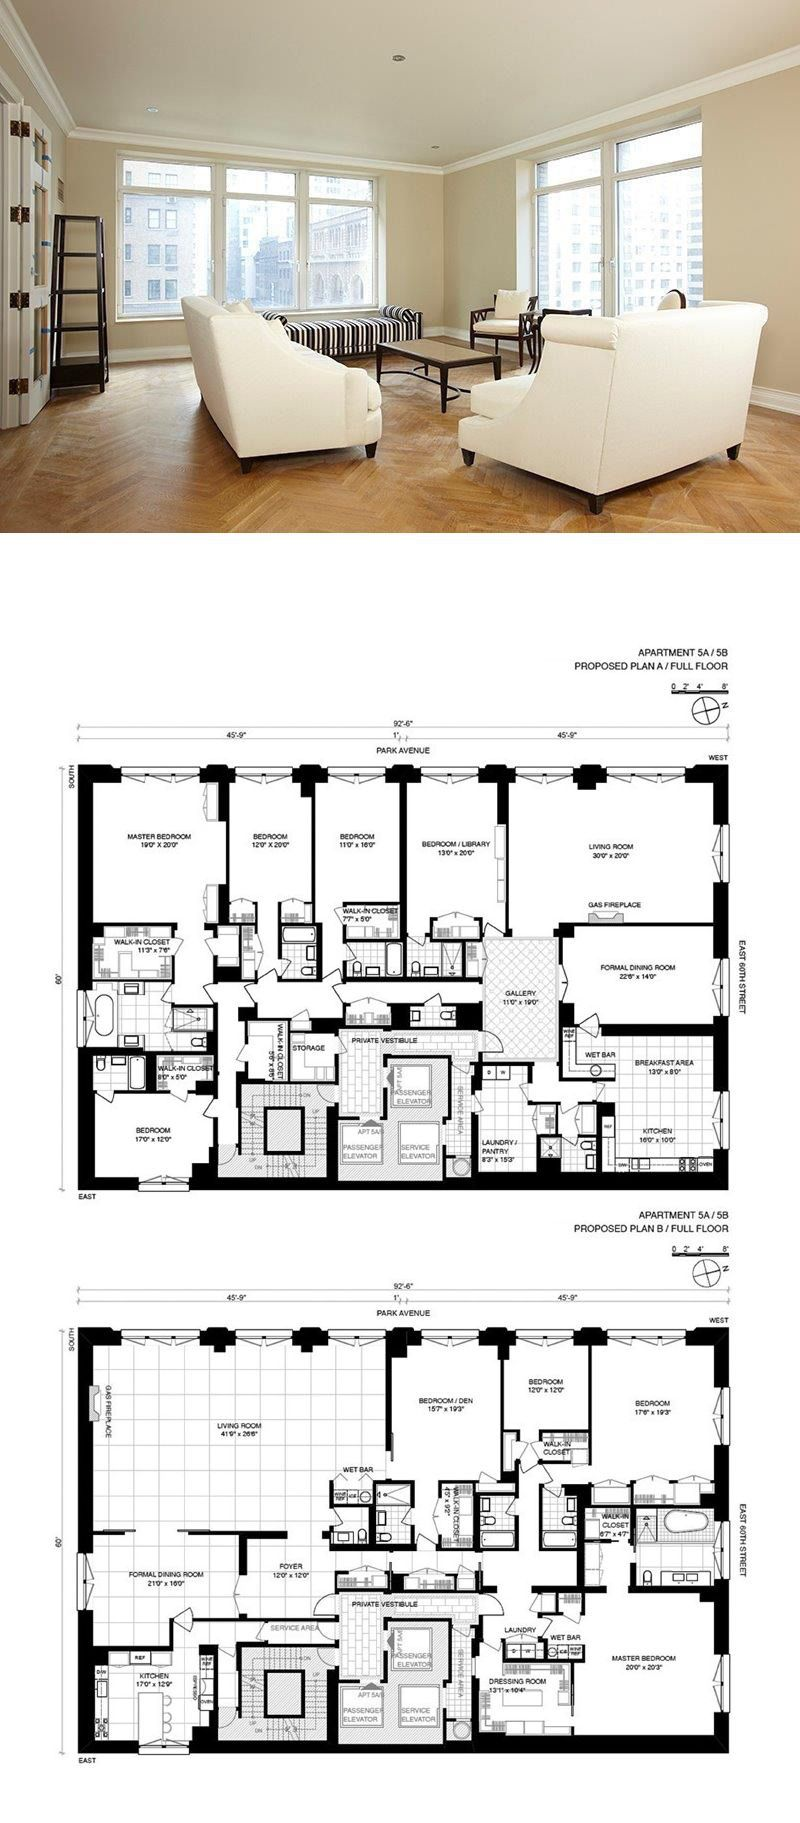 515 Park Ave 5ab In Lenox Hill Manhattan Streeteasy Apartment Floor Plans New York Homes New York Apartments